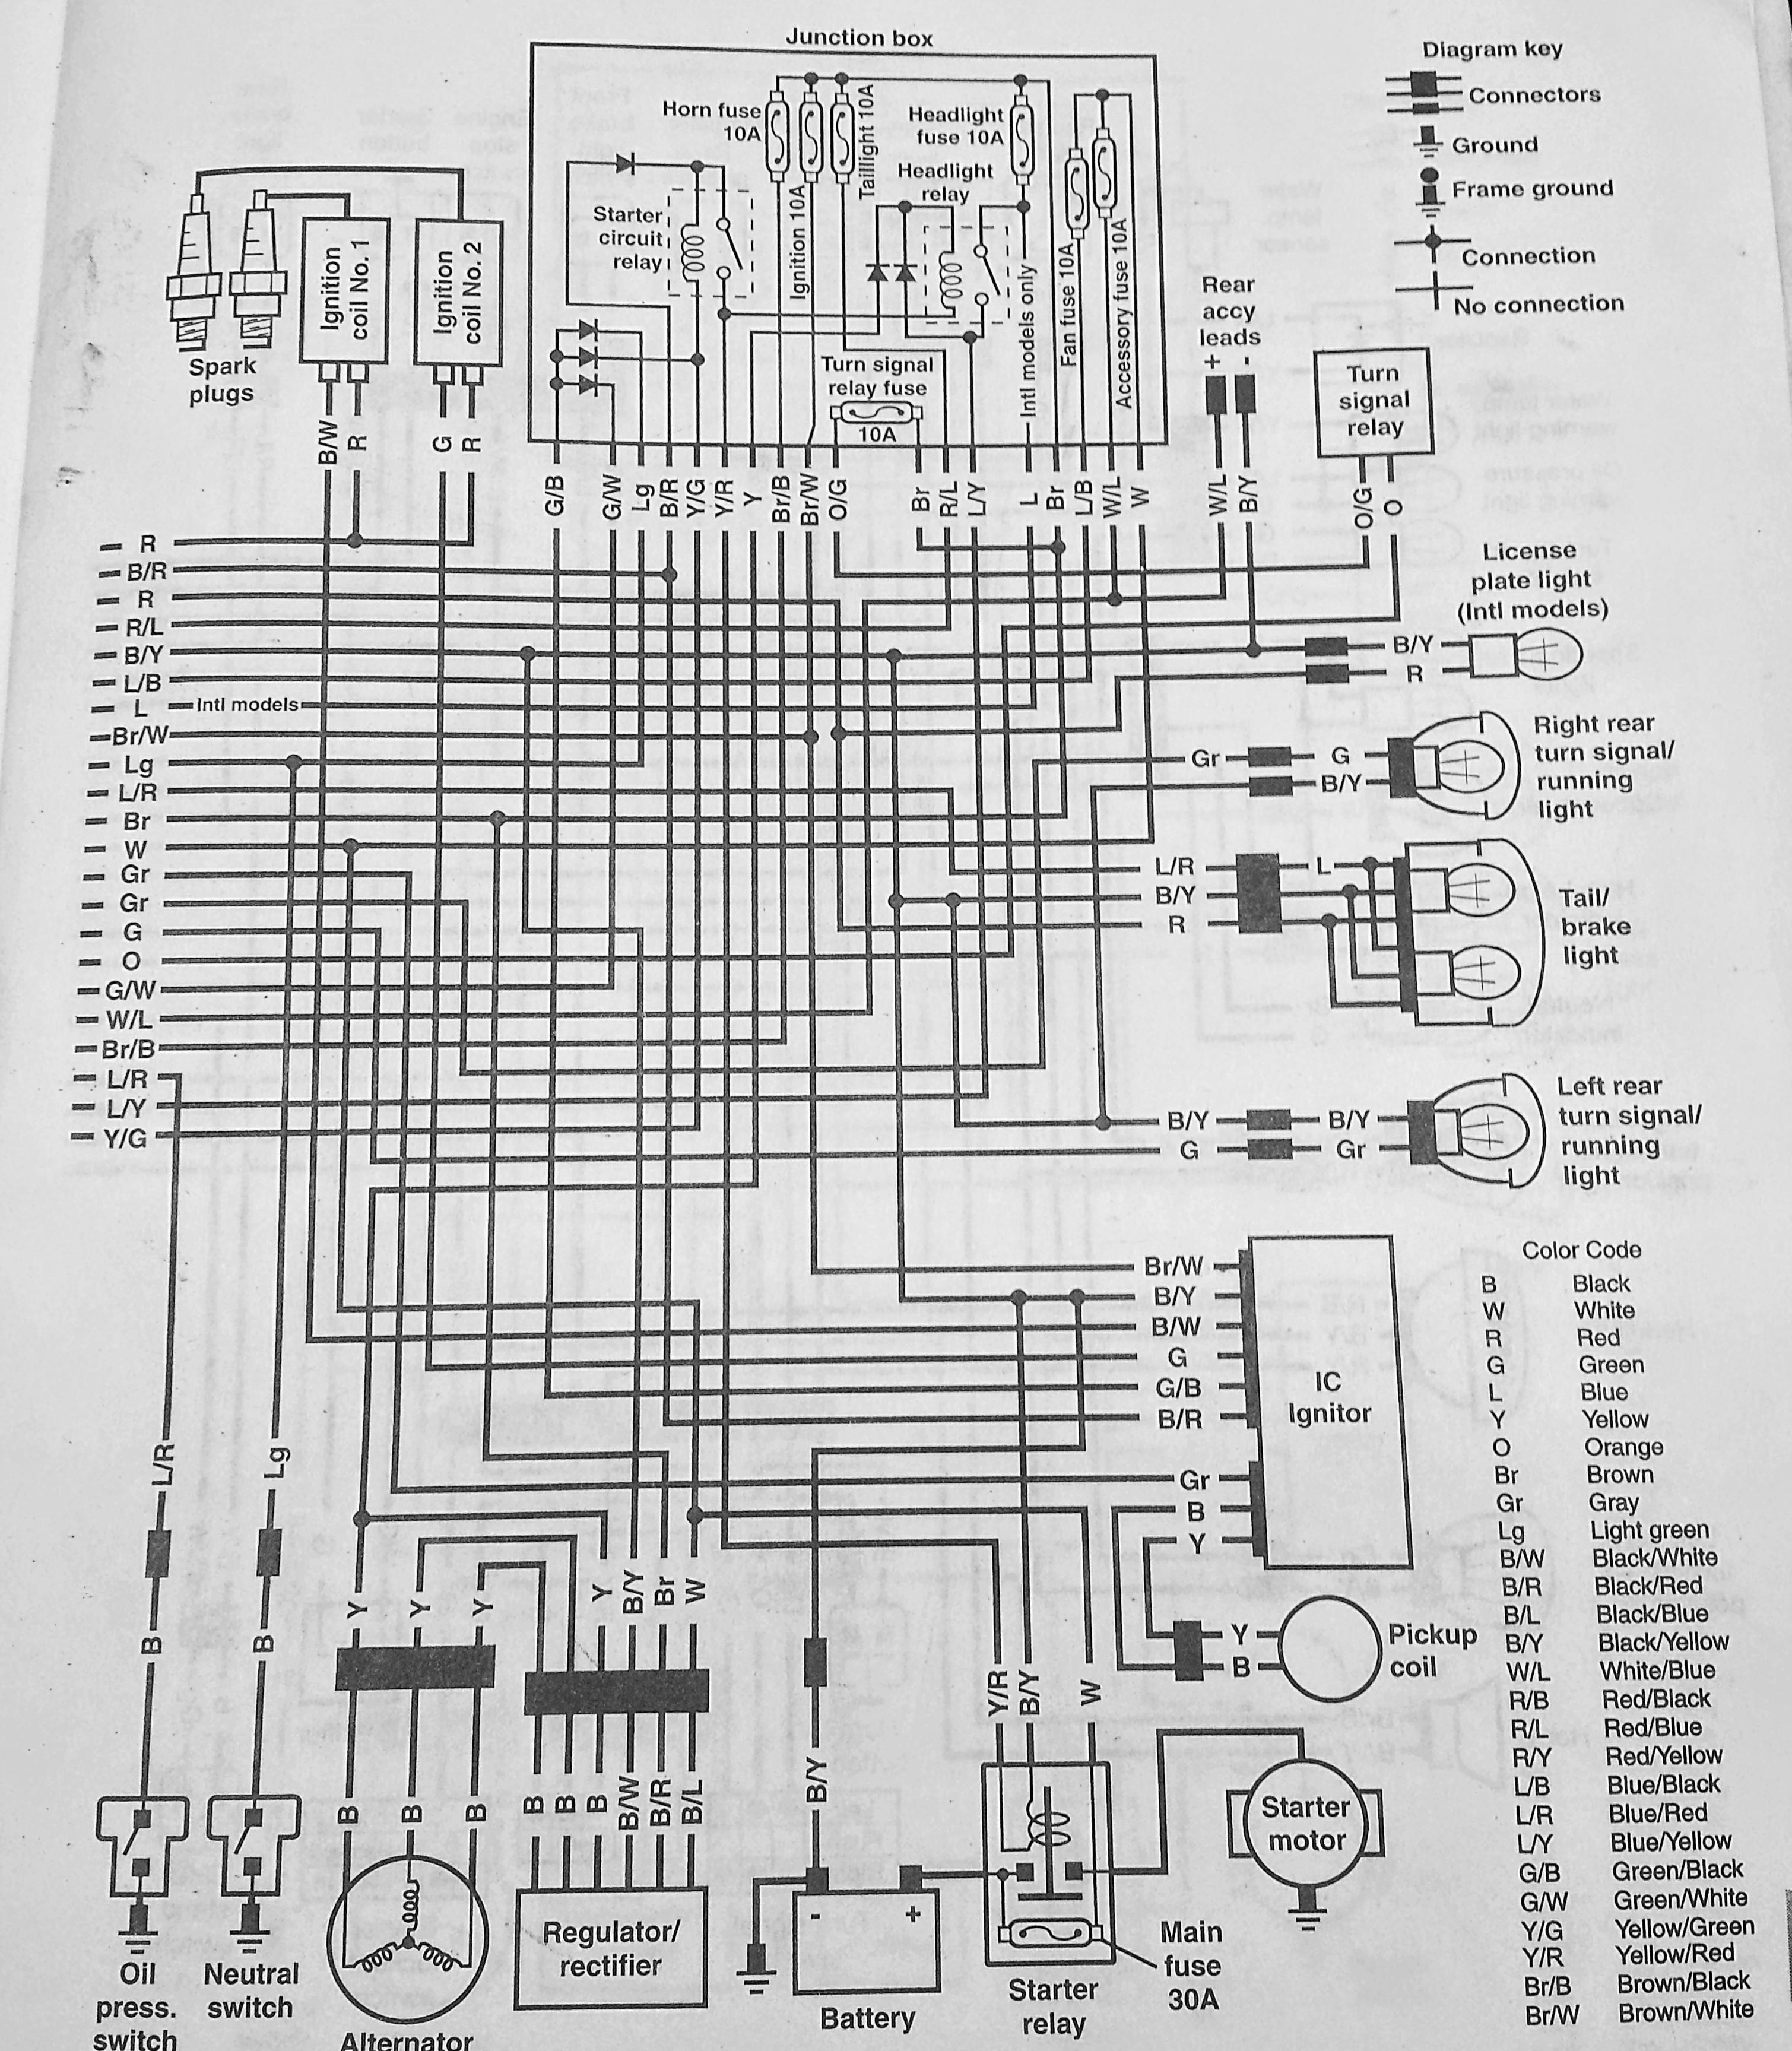 [SCHEMATICS_4PO]  RL_1798] Kawasaki En500 Wiring Diagram Free Diagram | Vulcan 500 Wiring Diagram |  | Bios Attr Menia Ehir Amenti Xolia Nful Mohammedshrine Librar Wiring 101